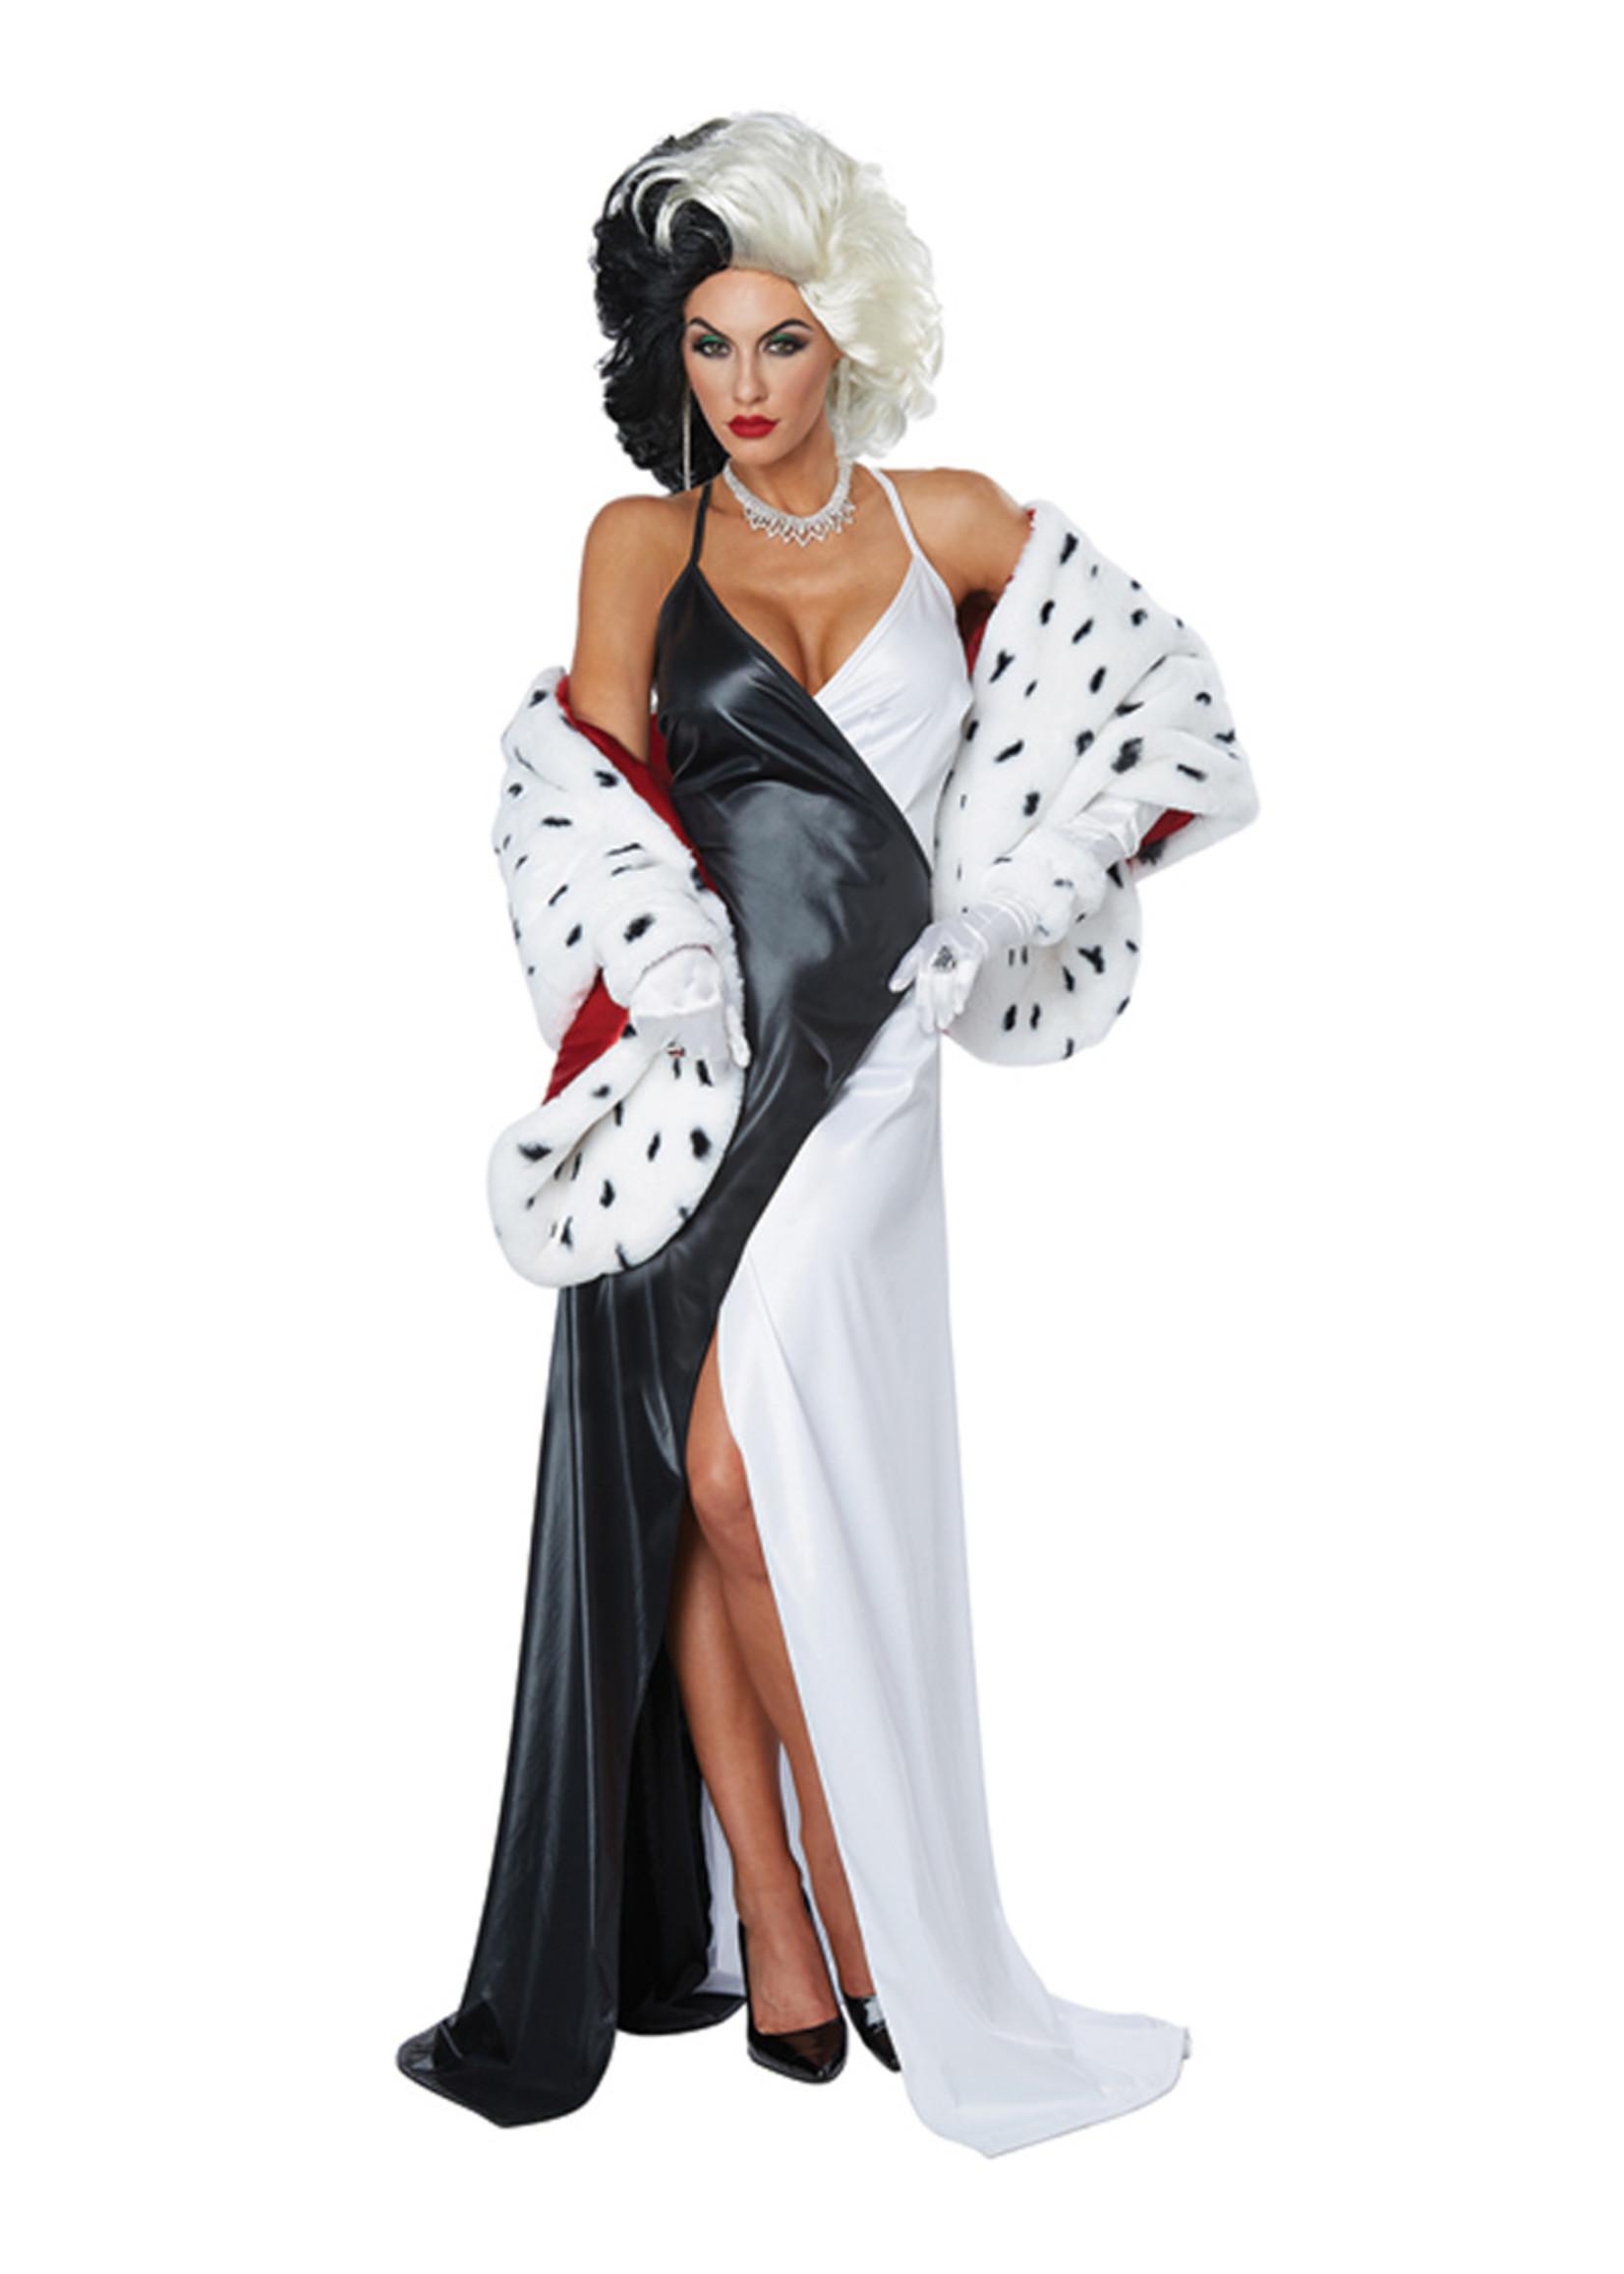 Cruel Diva Costume - Women's